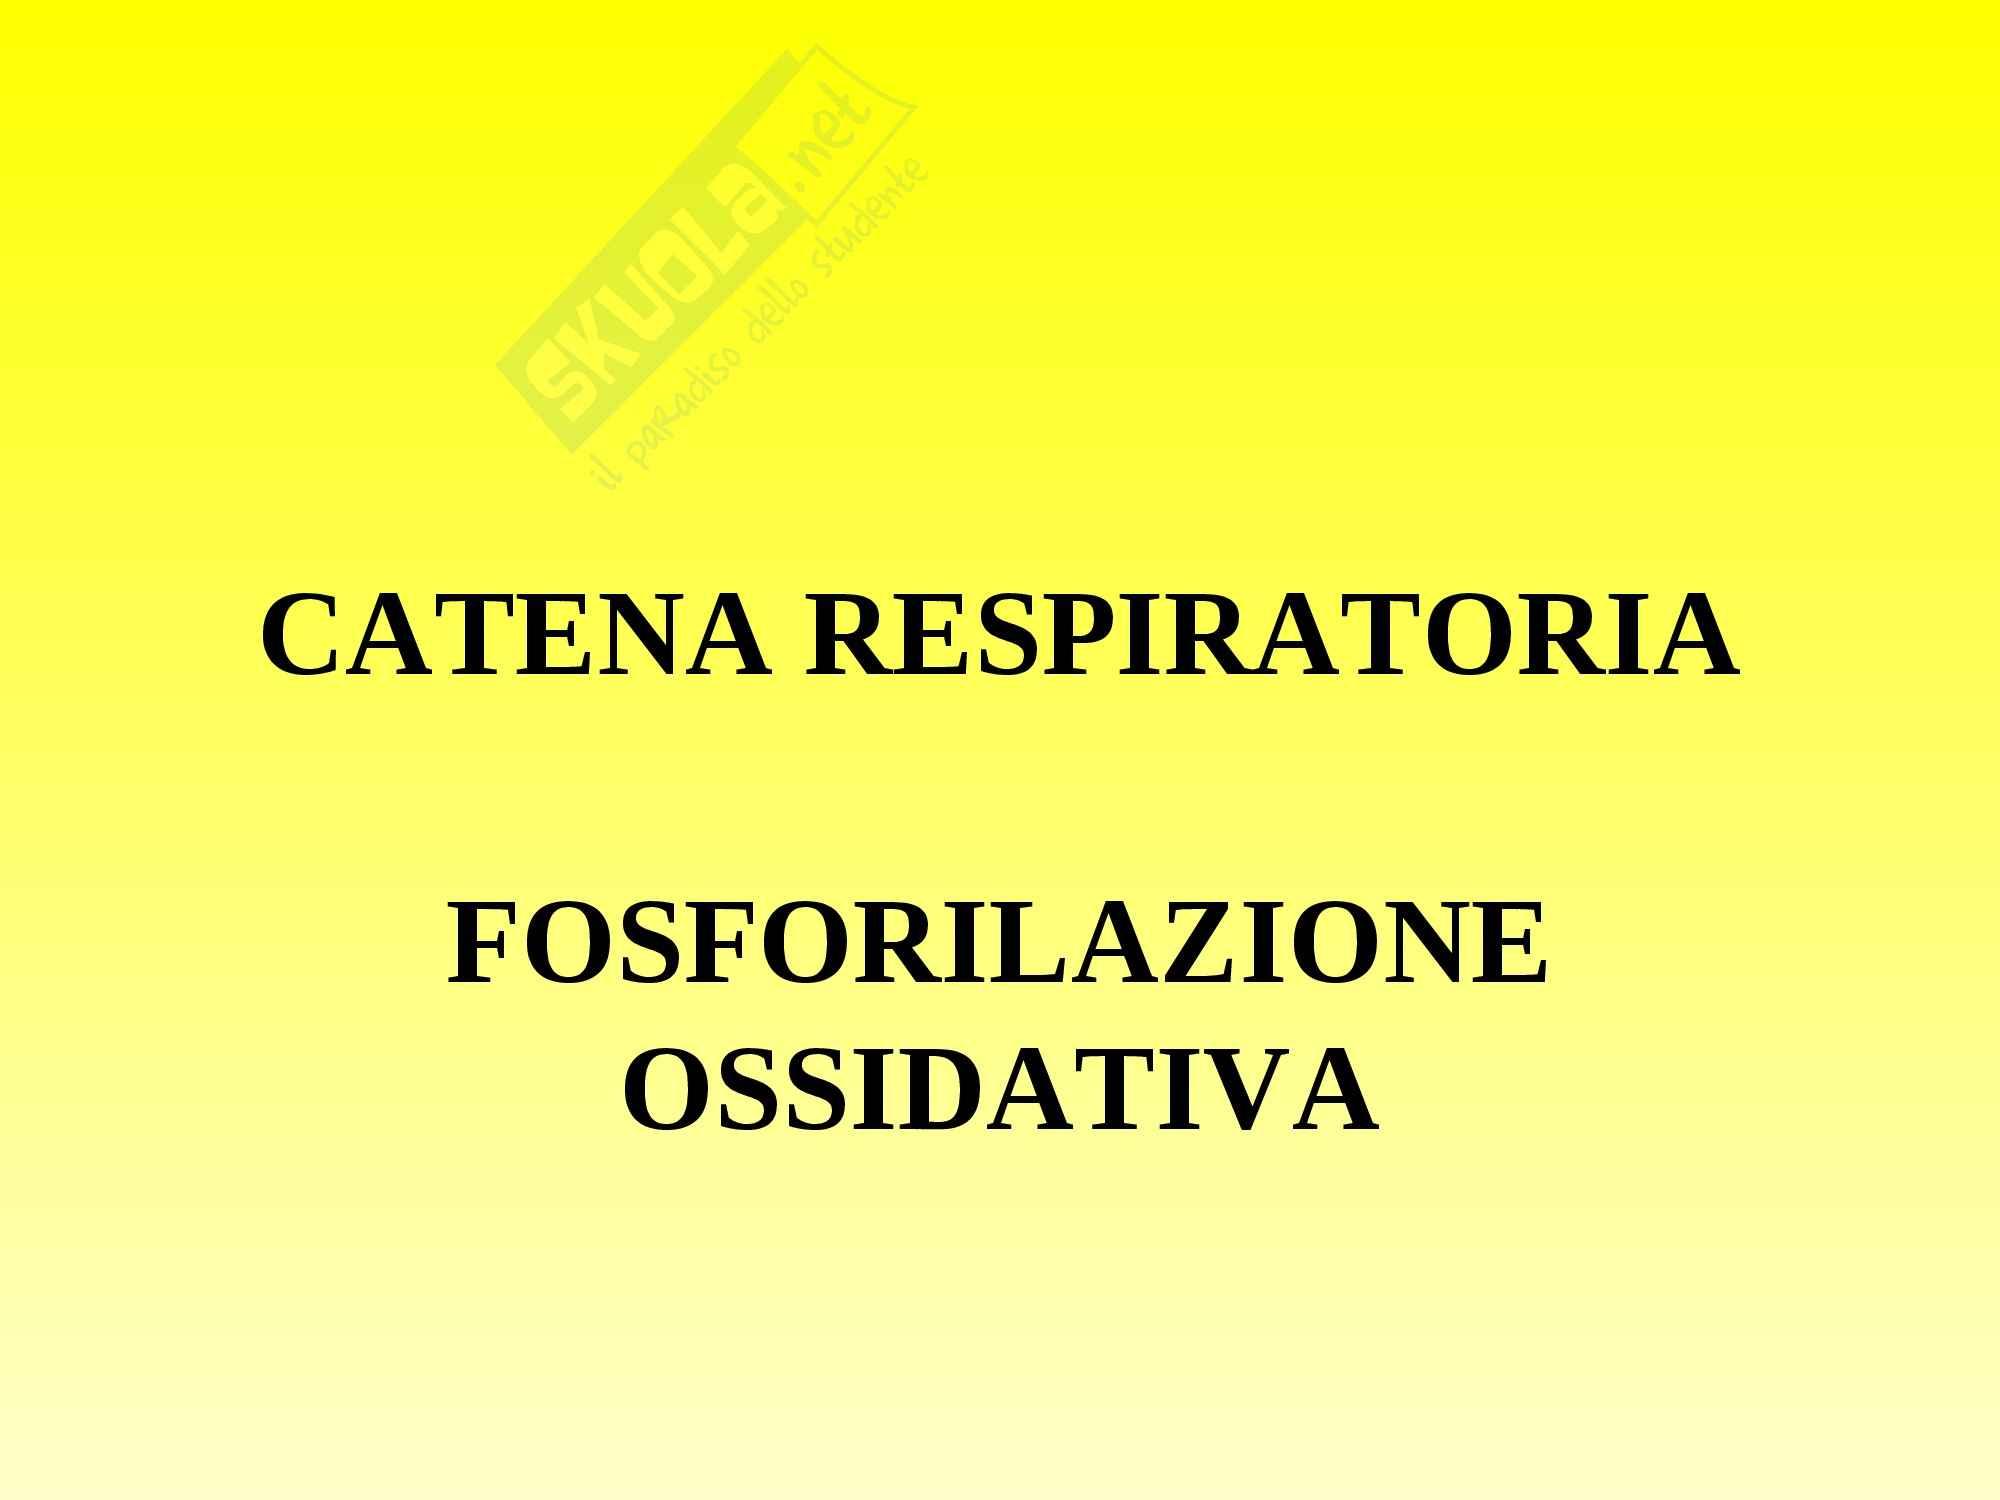 Biochimica - catena respiratoria e fosforilazione